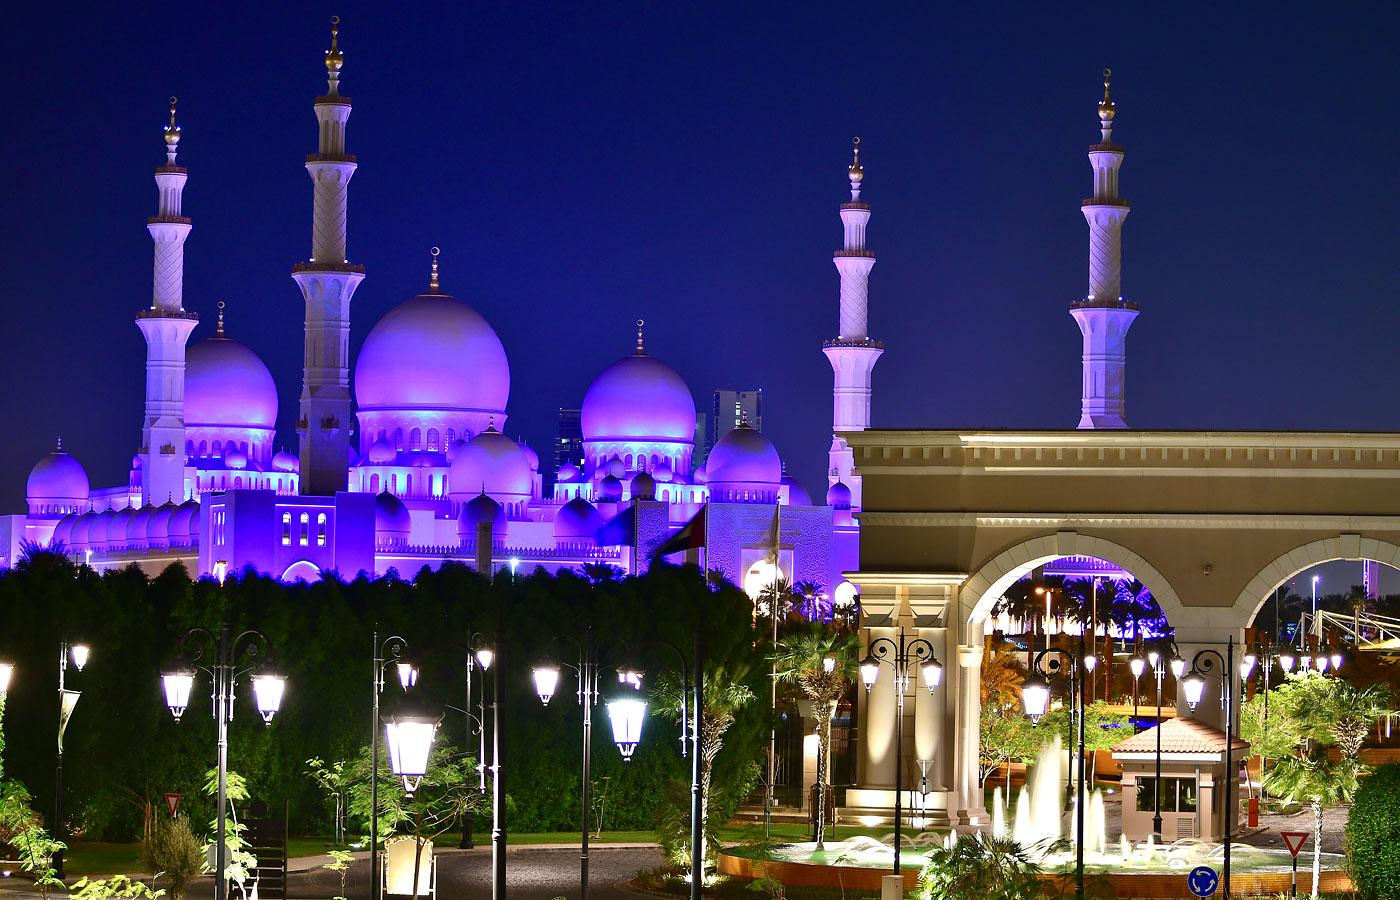 Sheikh Zayed Mosque (The Ritz-Carlton, Abu Dhabi)